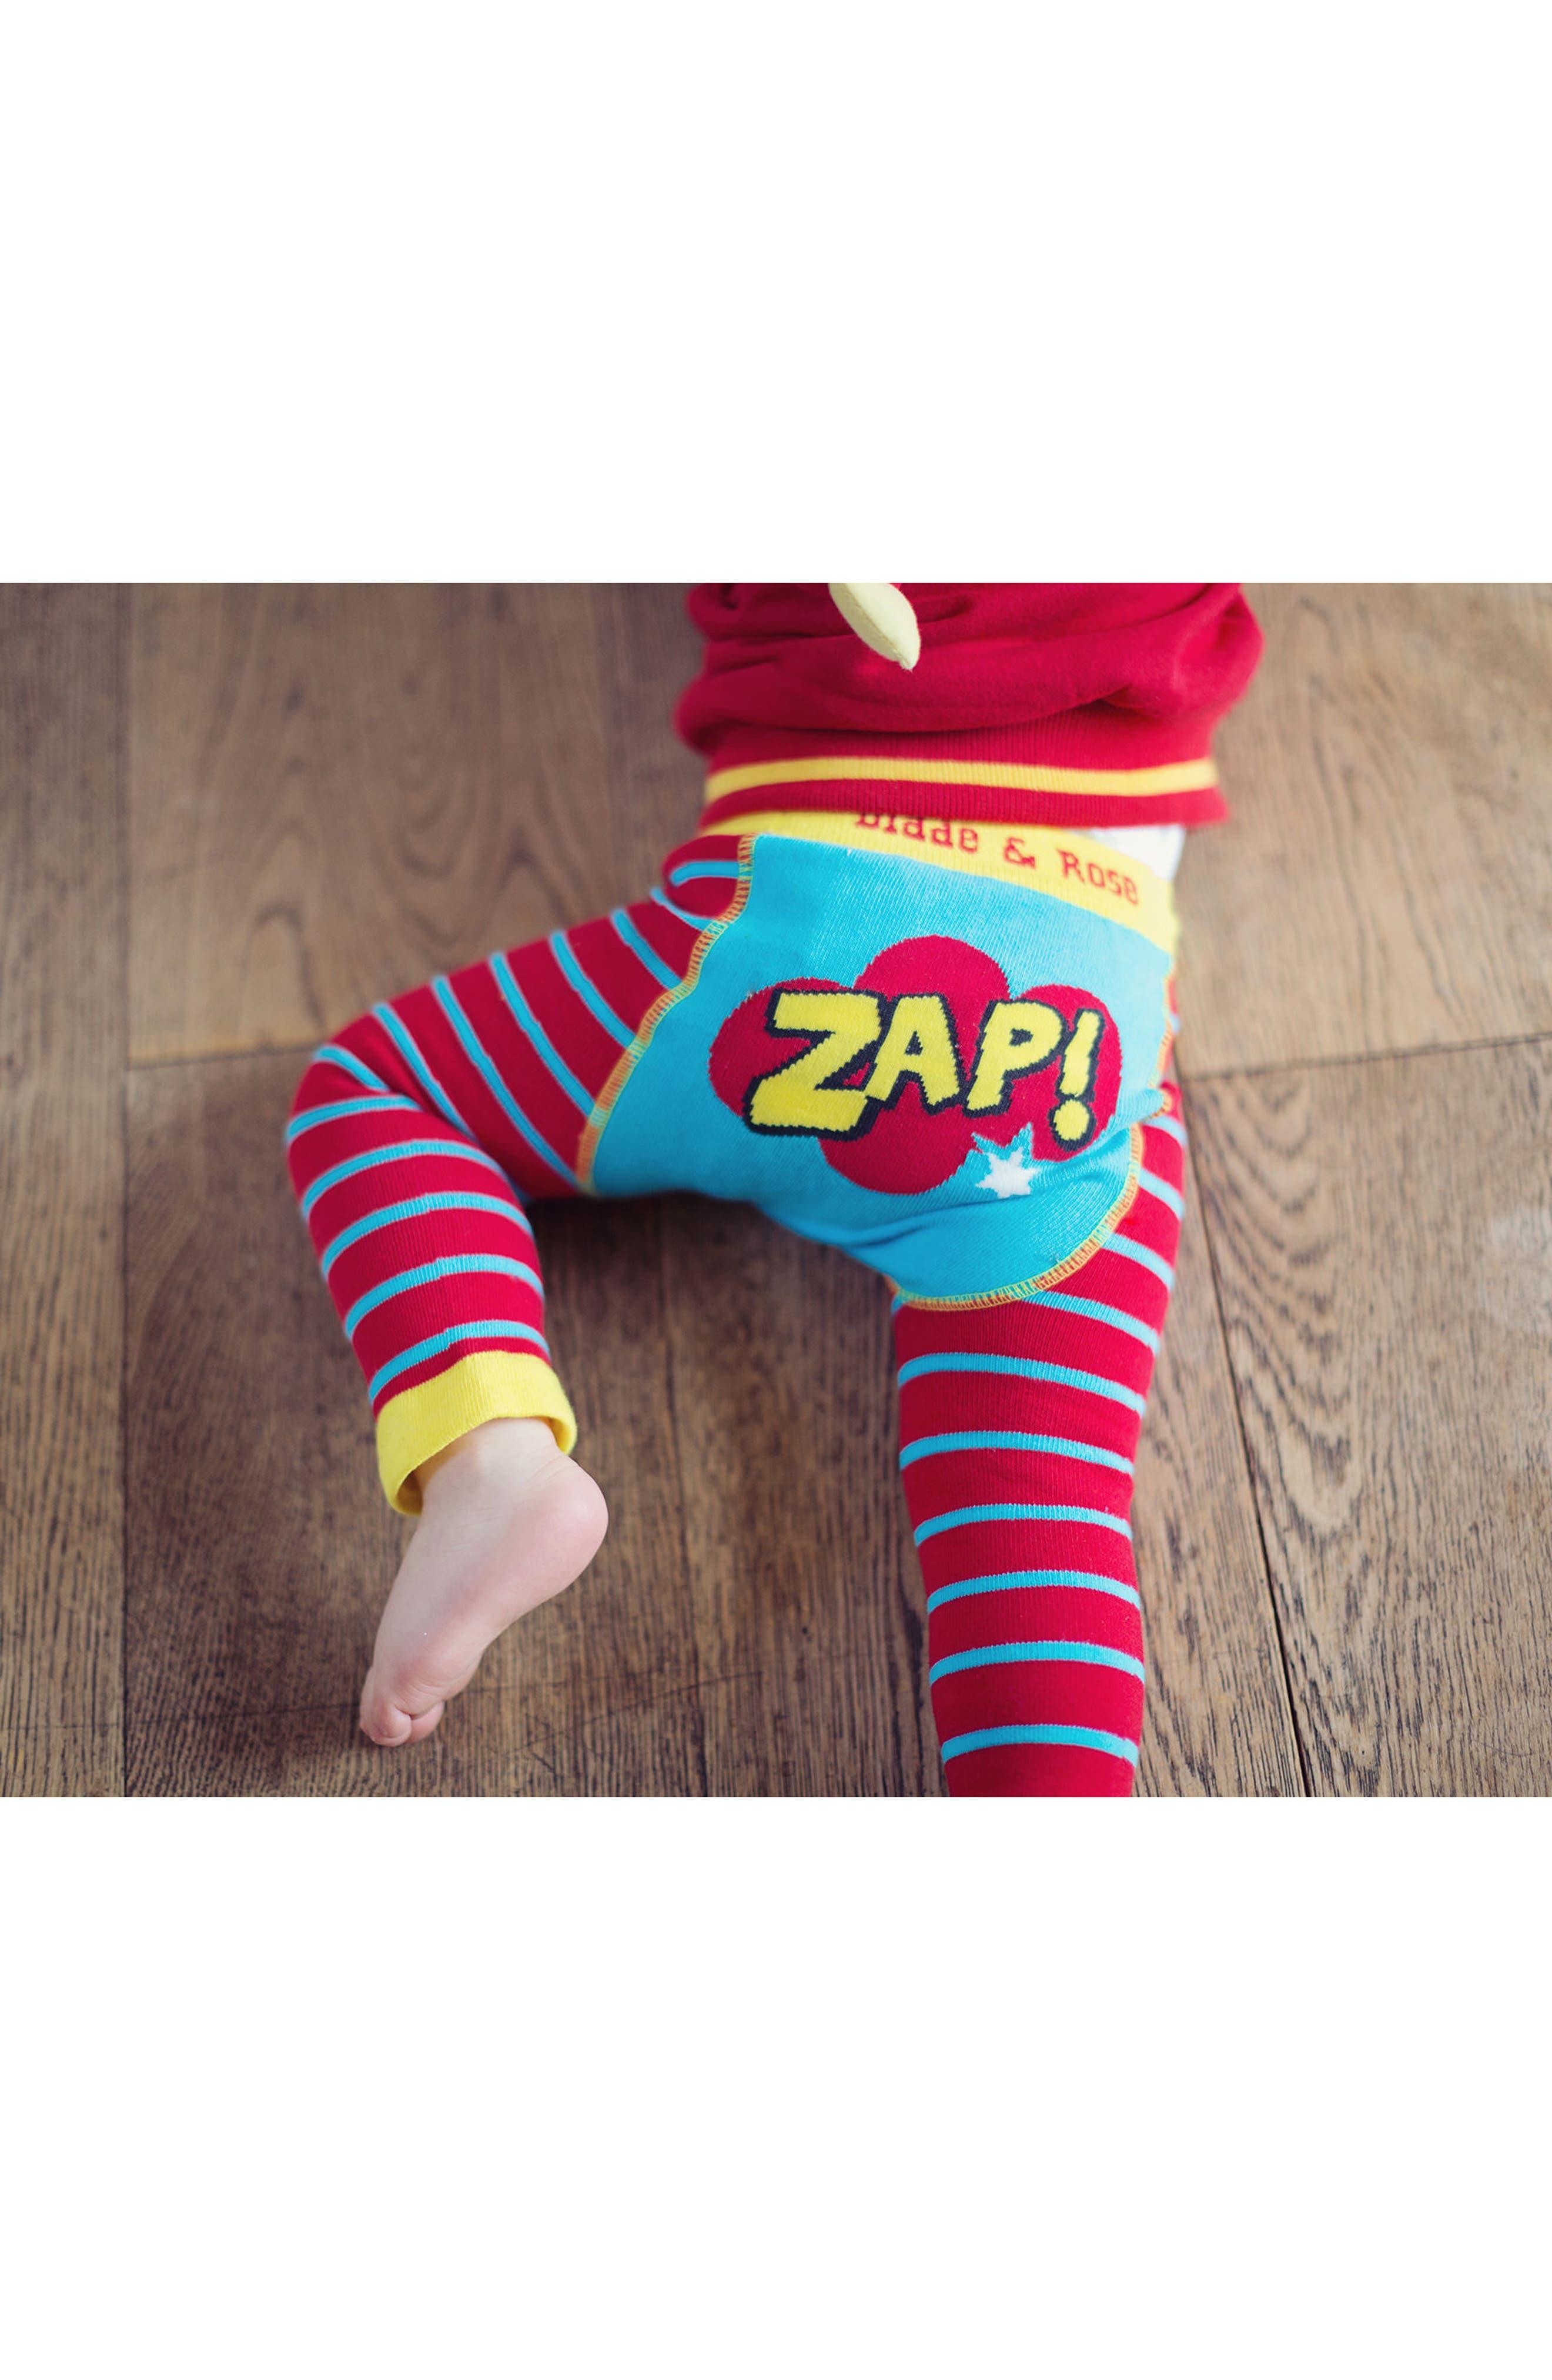 Zap Leggings,                             Alternate thumbnail 3, color,                             600